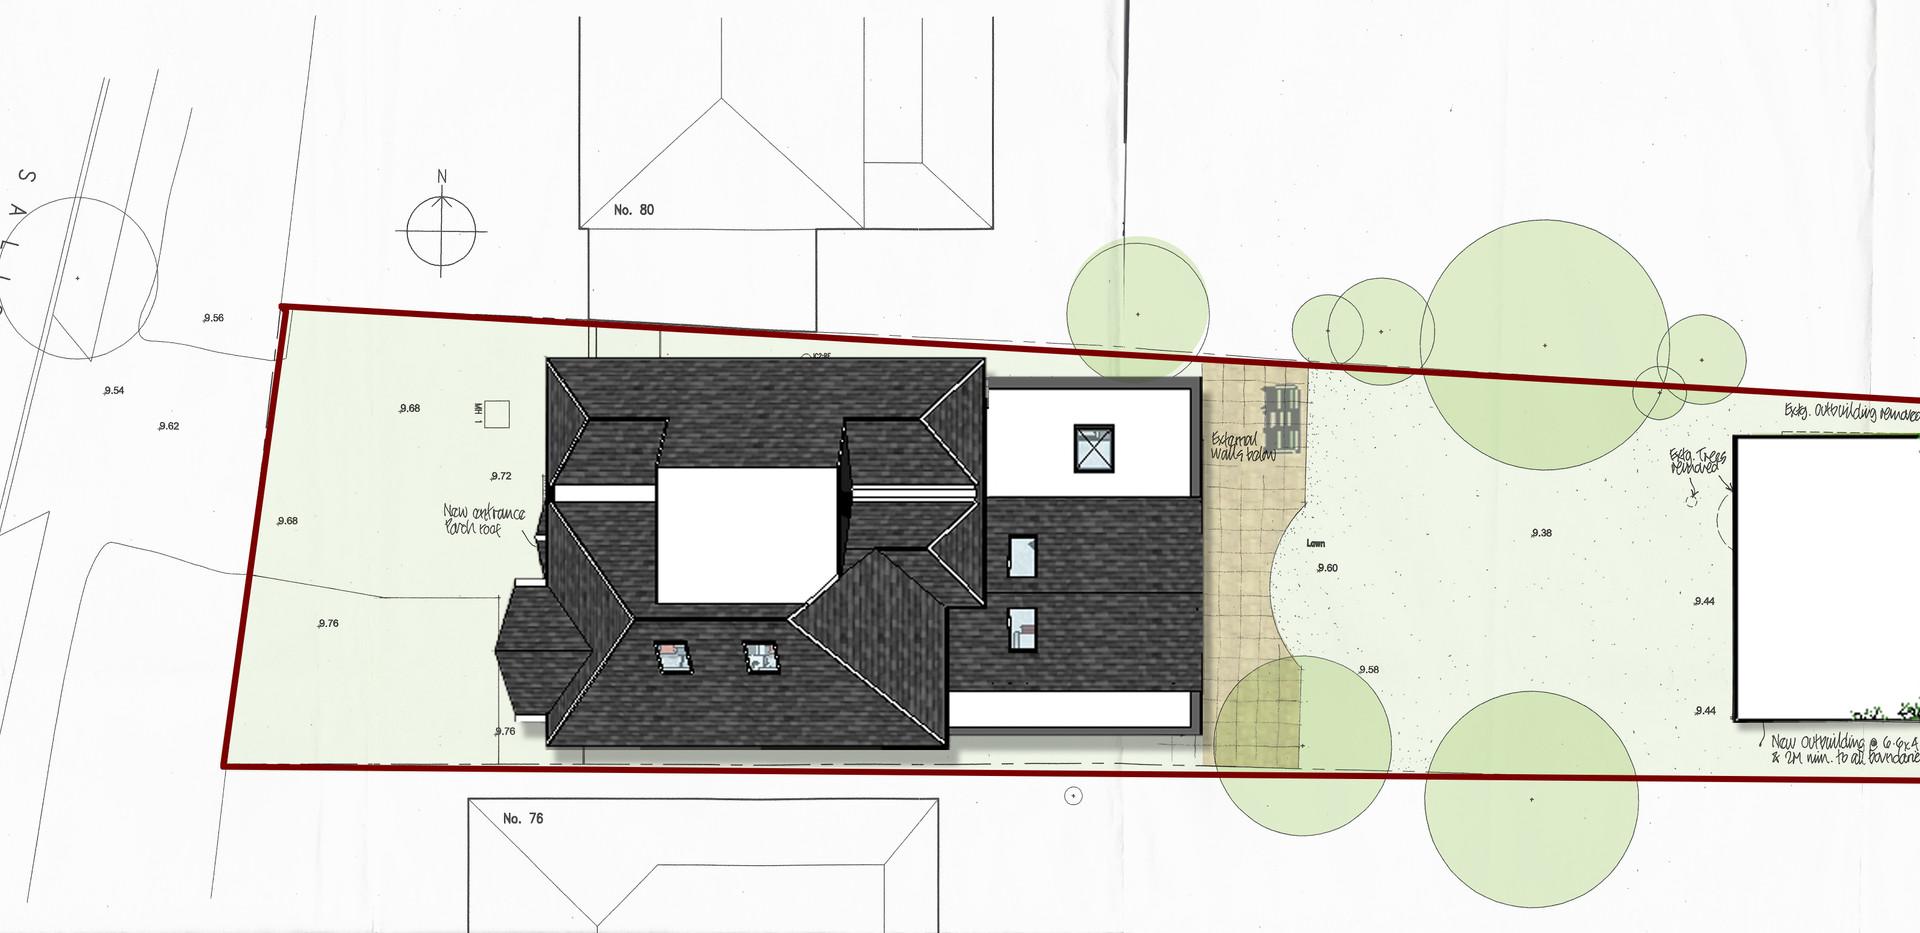 02 Site plan.JPG